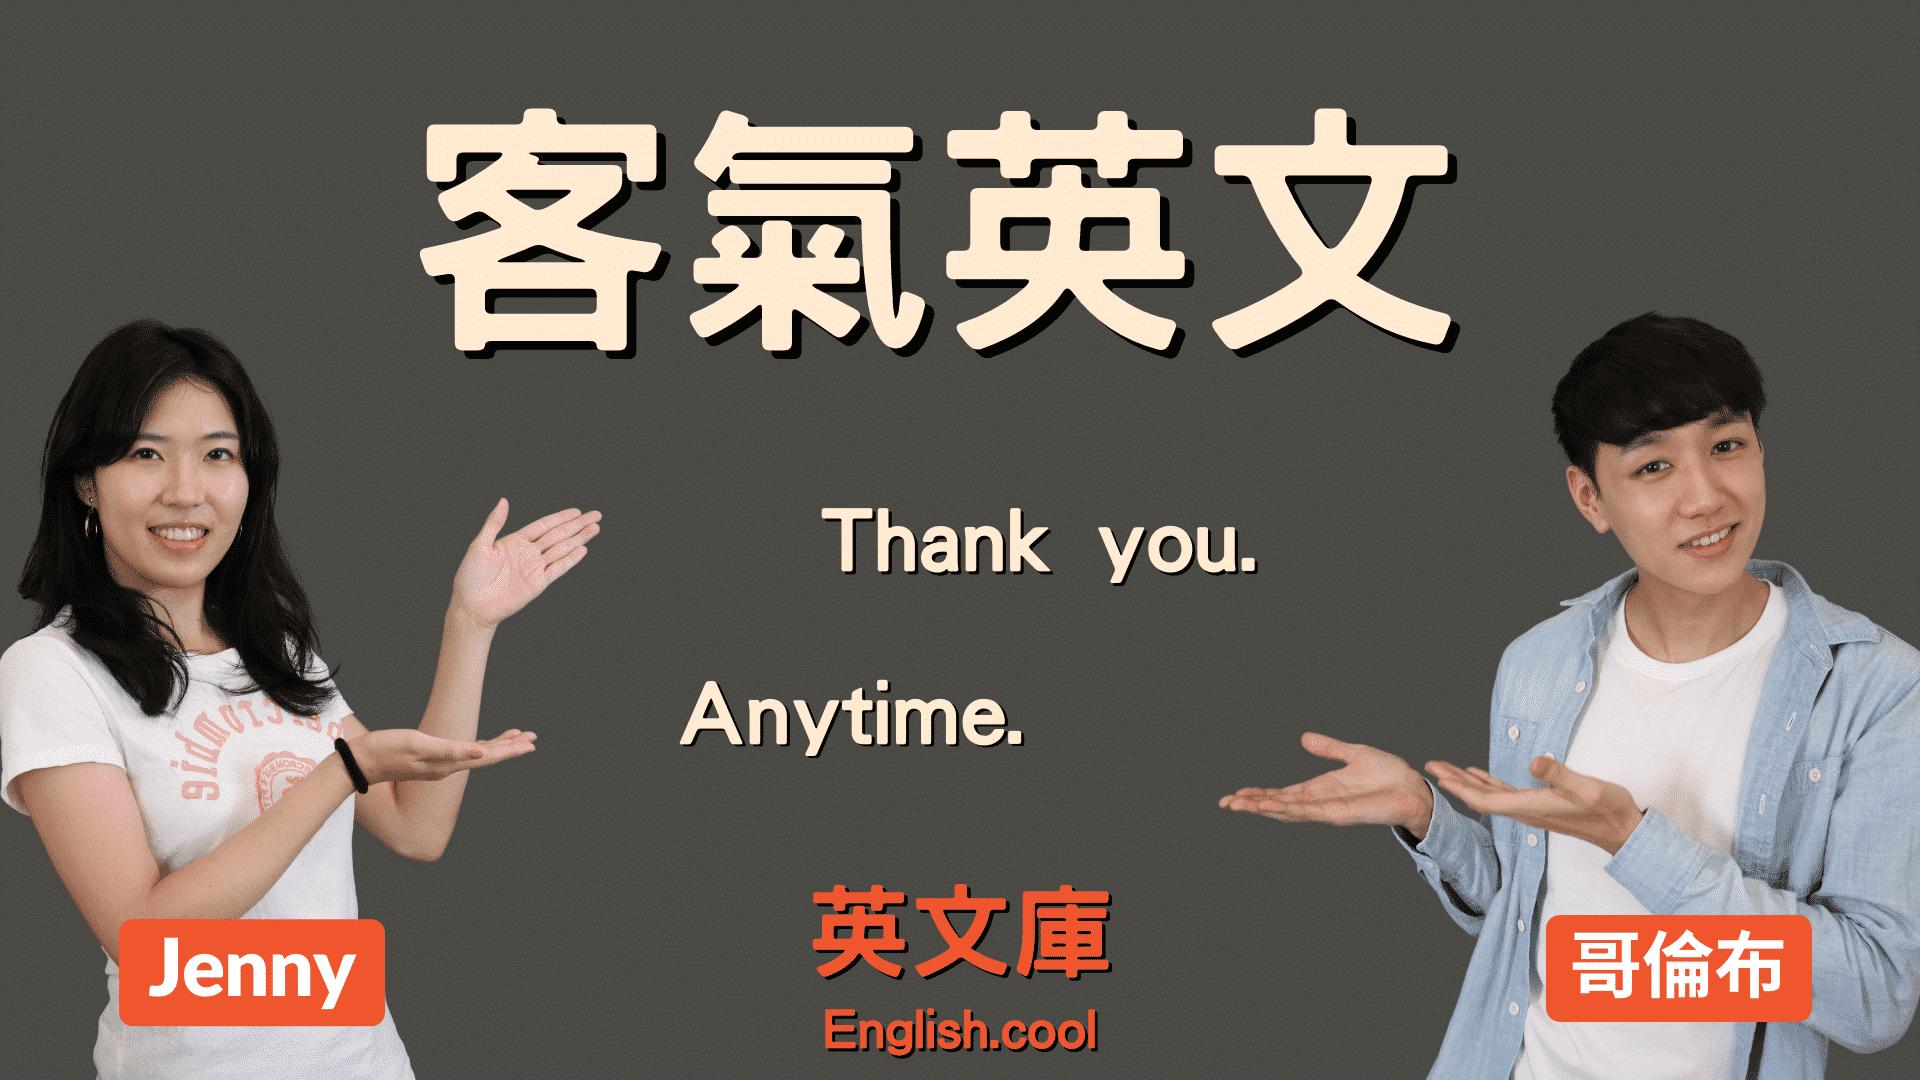 You are currently viewing 【客氣英文】麻煩了?請多指教?貴公司?來學有禮貌/客套的英文!